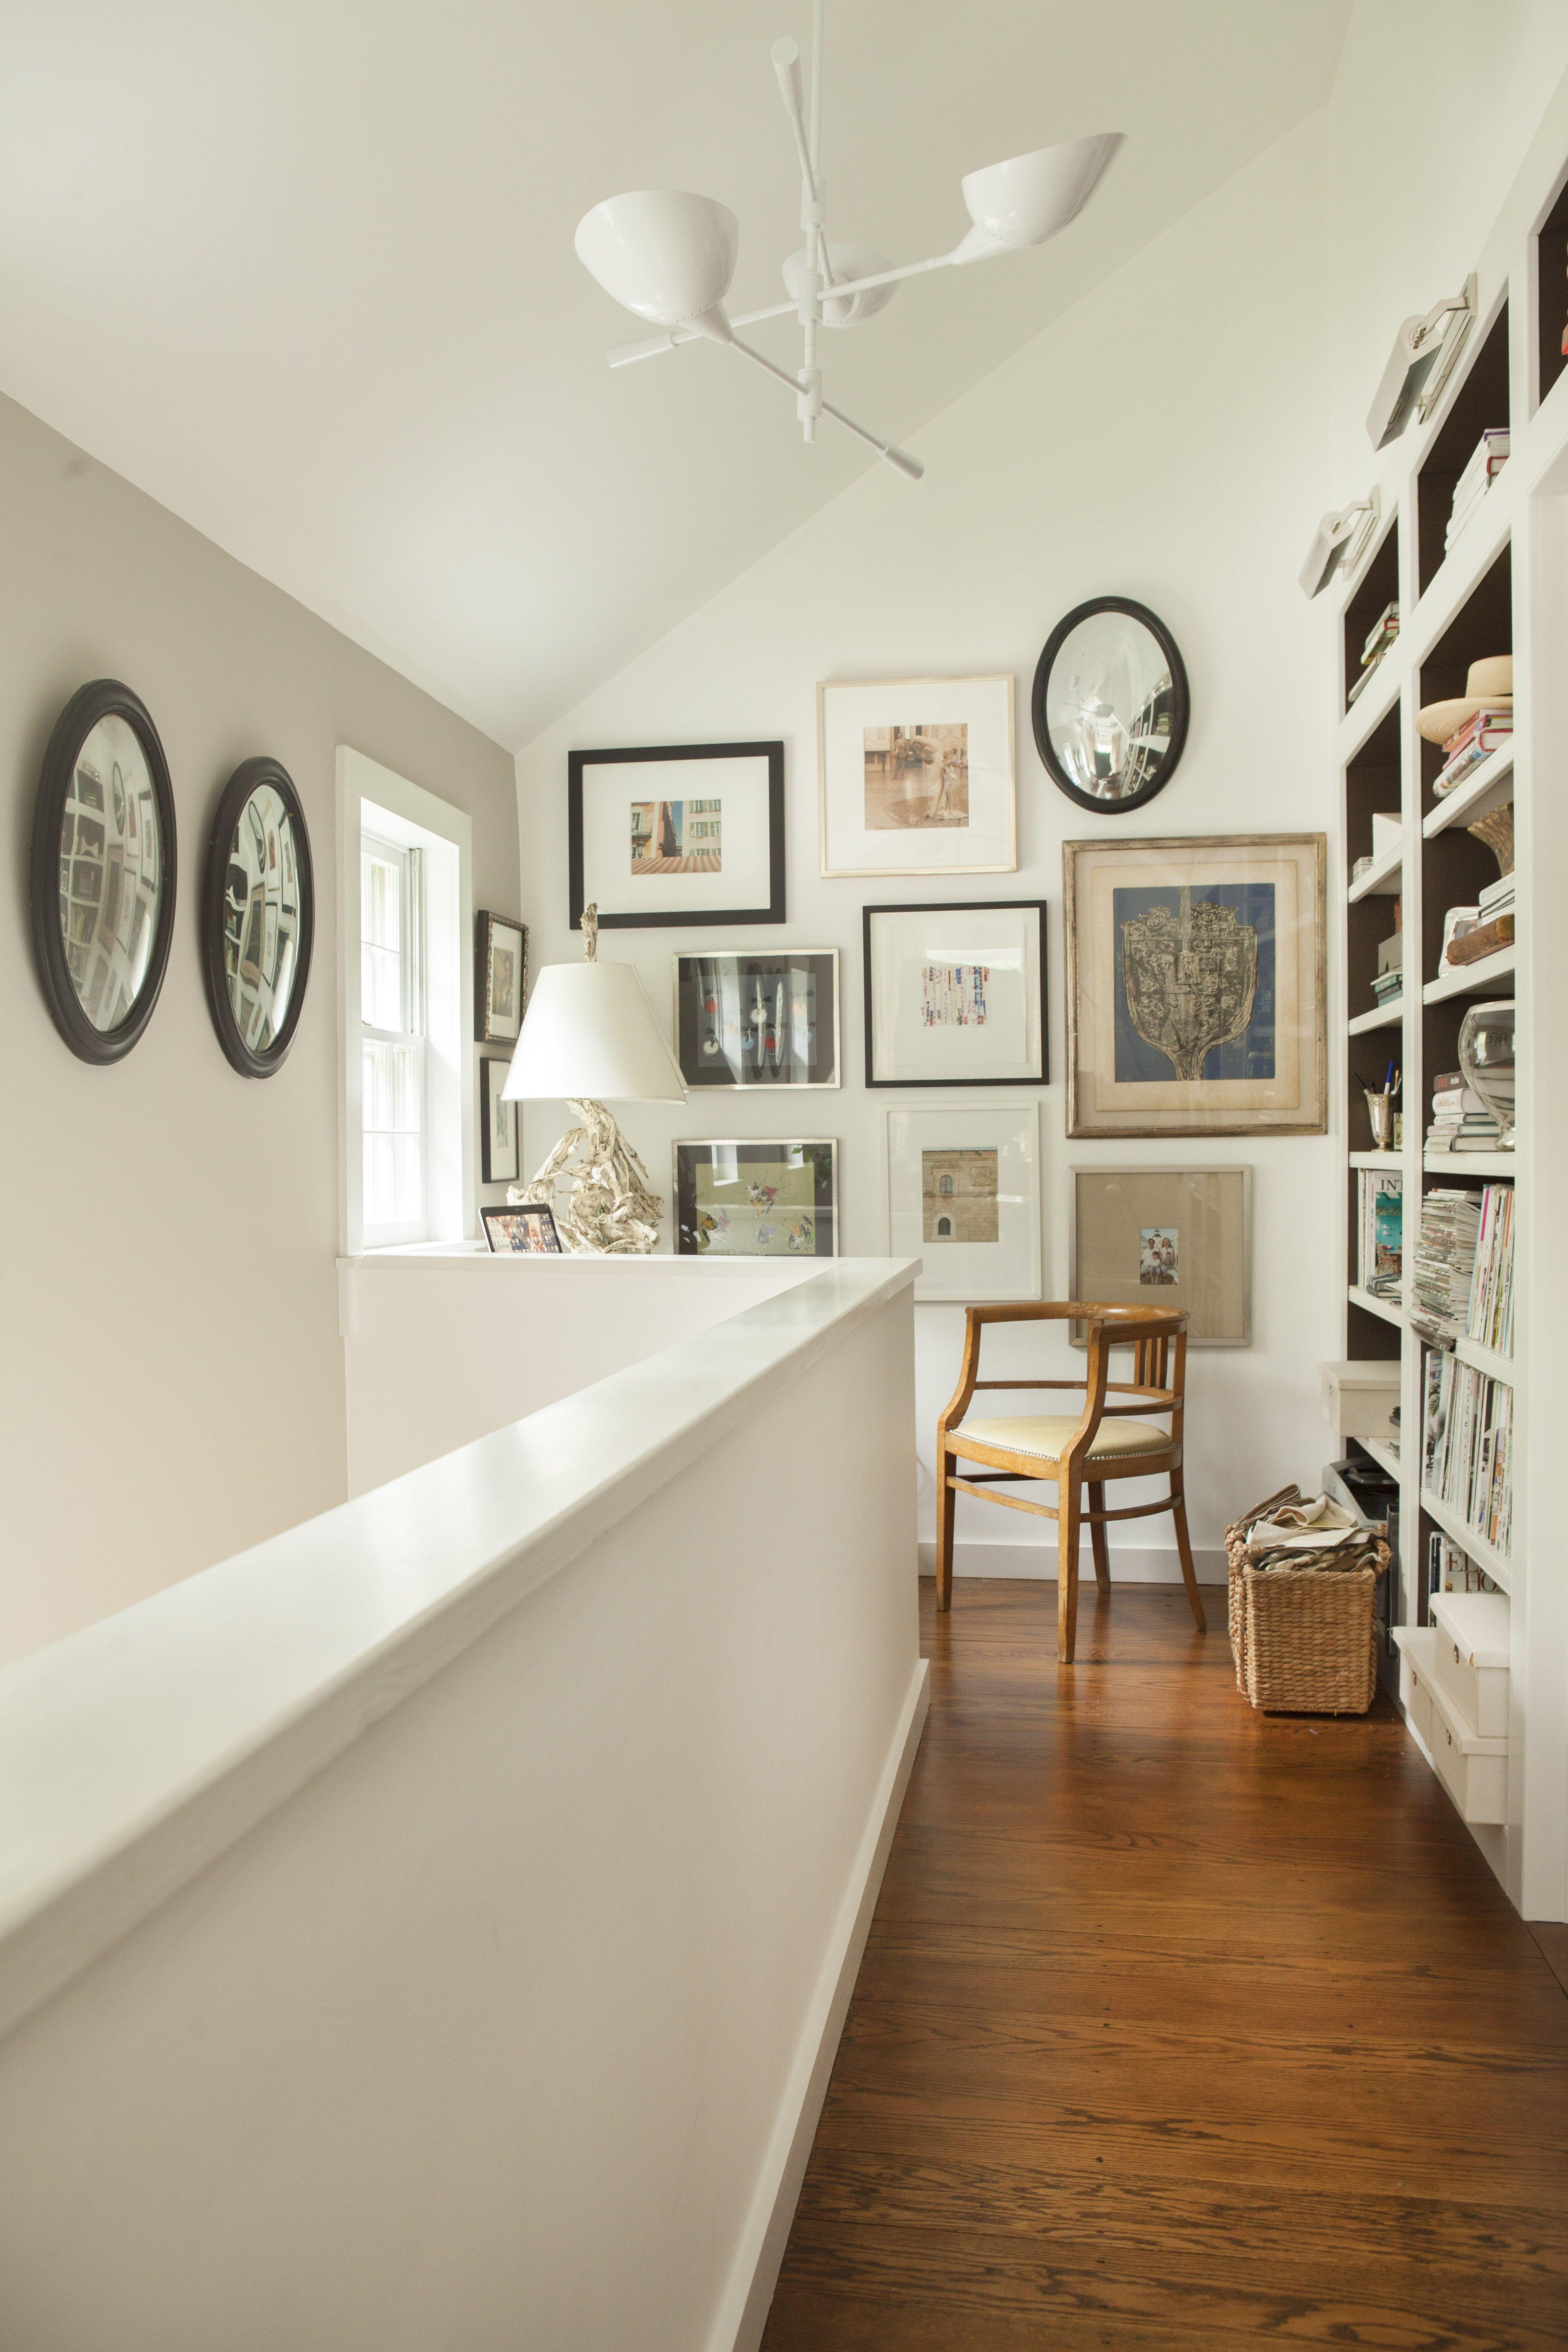 Hallway design by sb long interiors photo credit neil landino